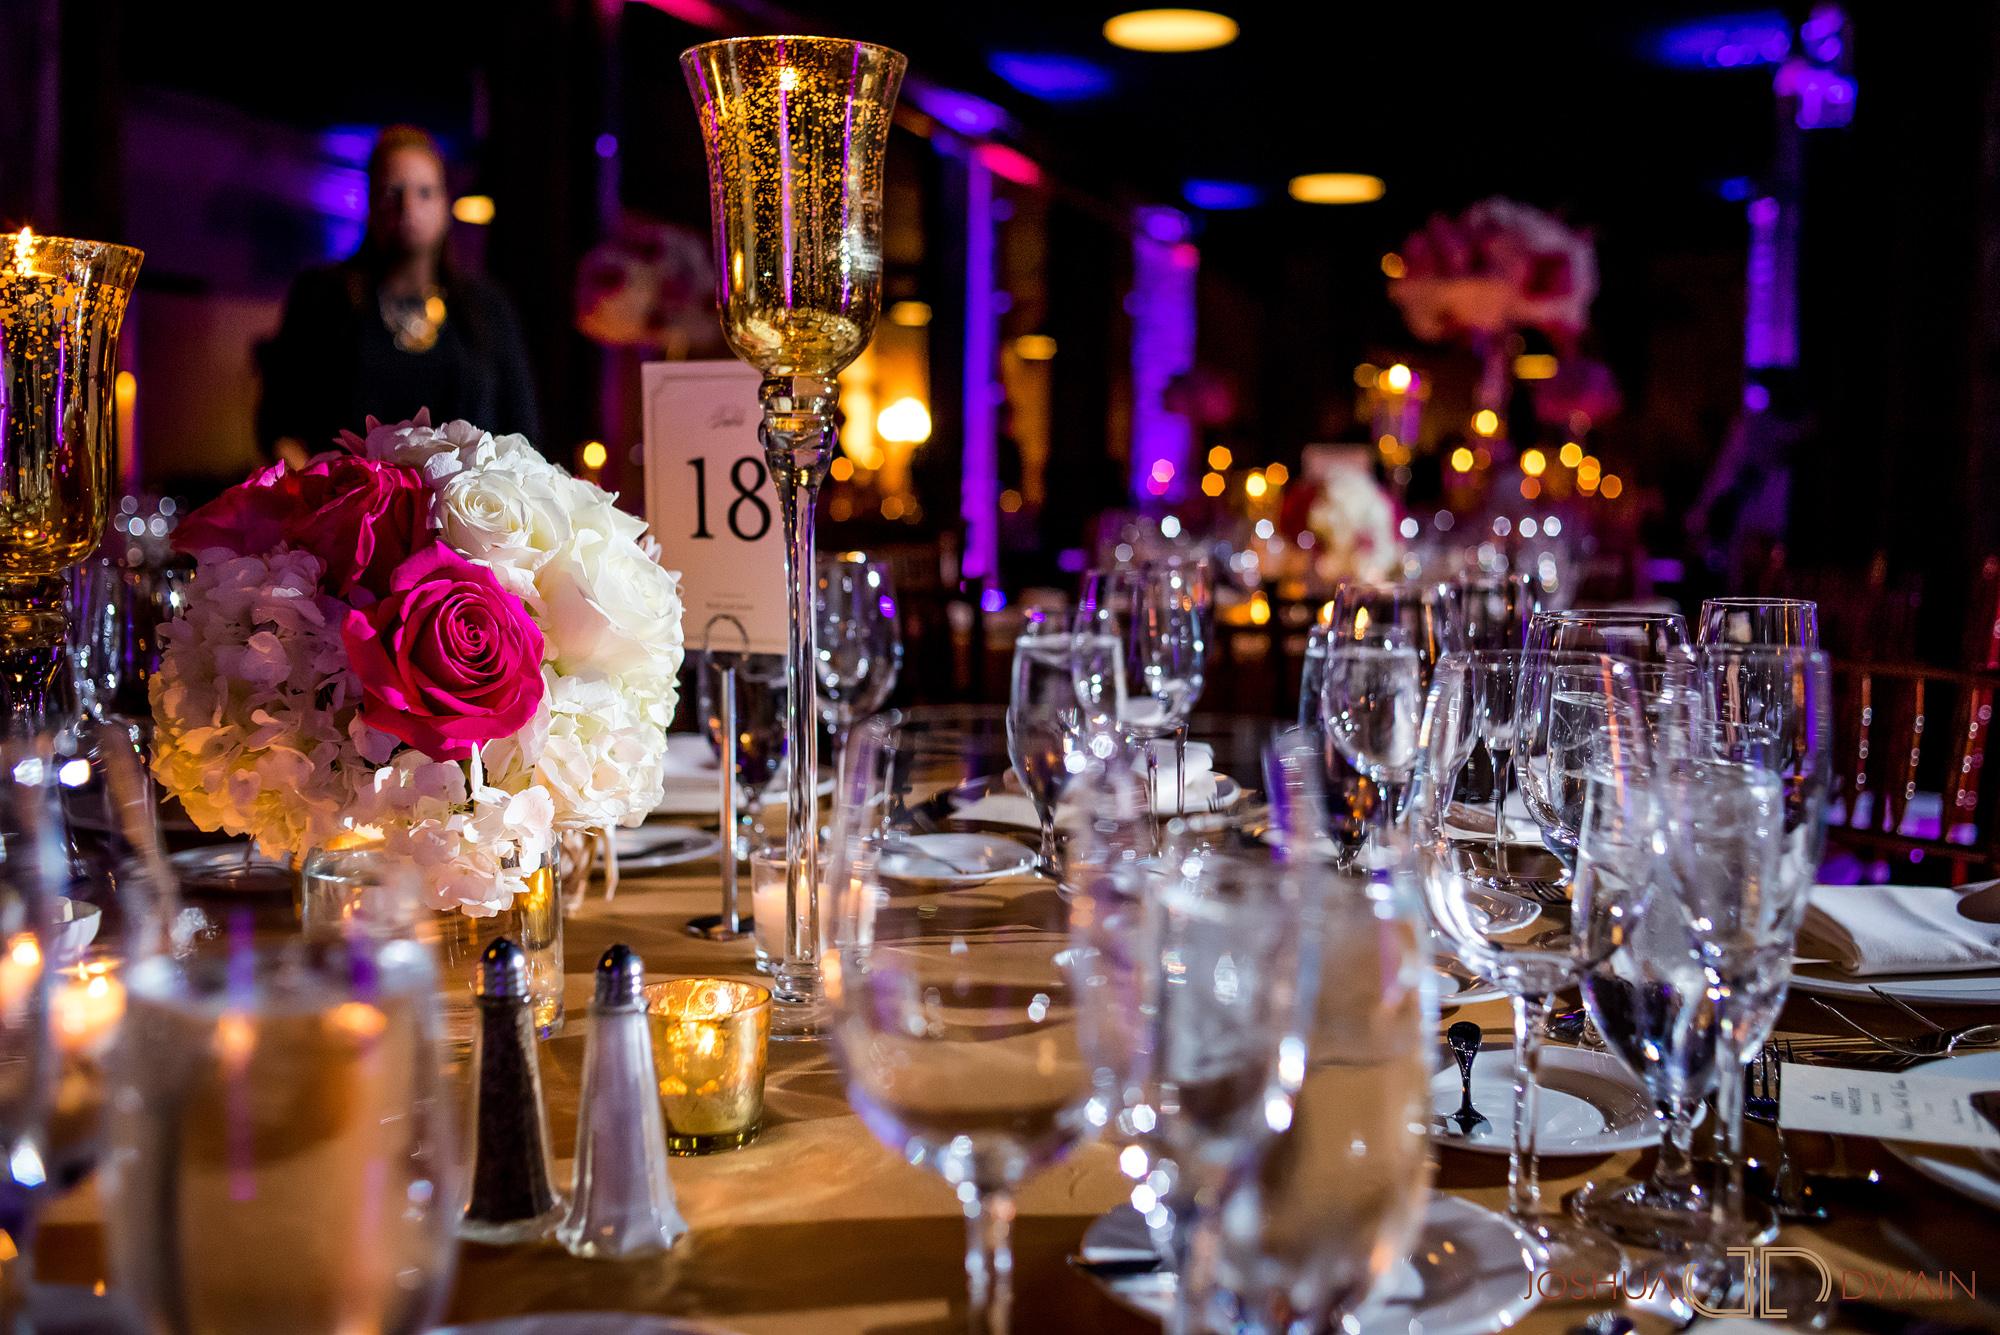 heidi-justin-023-liberty-warehouse-Co-Cathedral-of-St-Joseph -brooklyn-ny-wedding-photographer-joshua-dwain